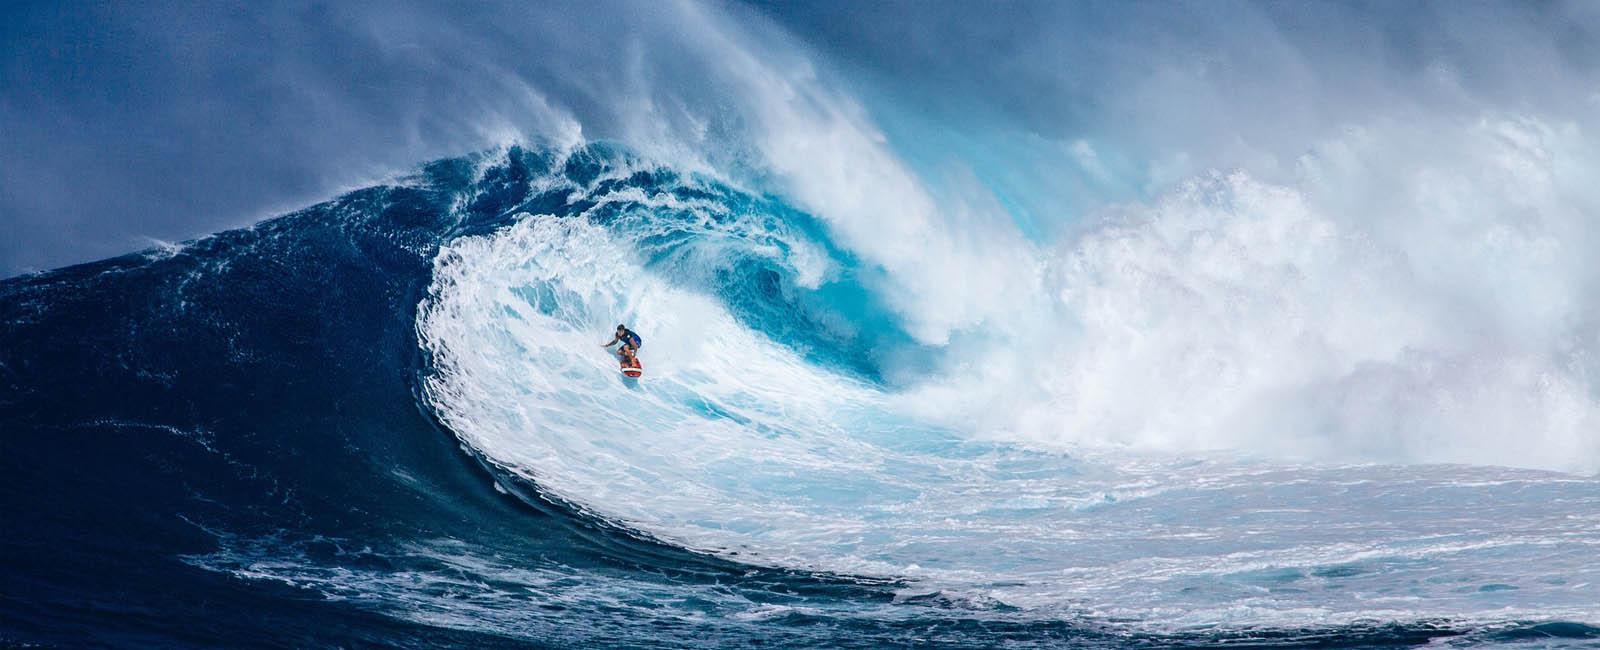 surf-kynay3